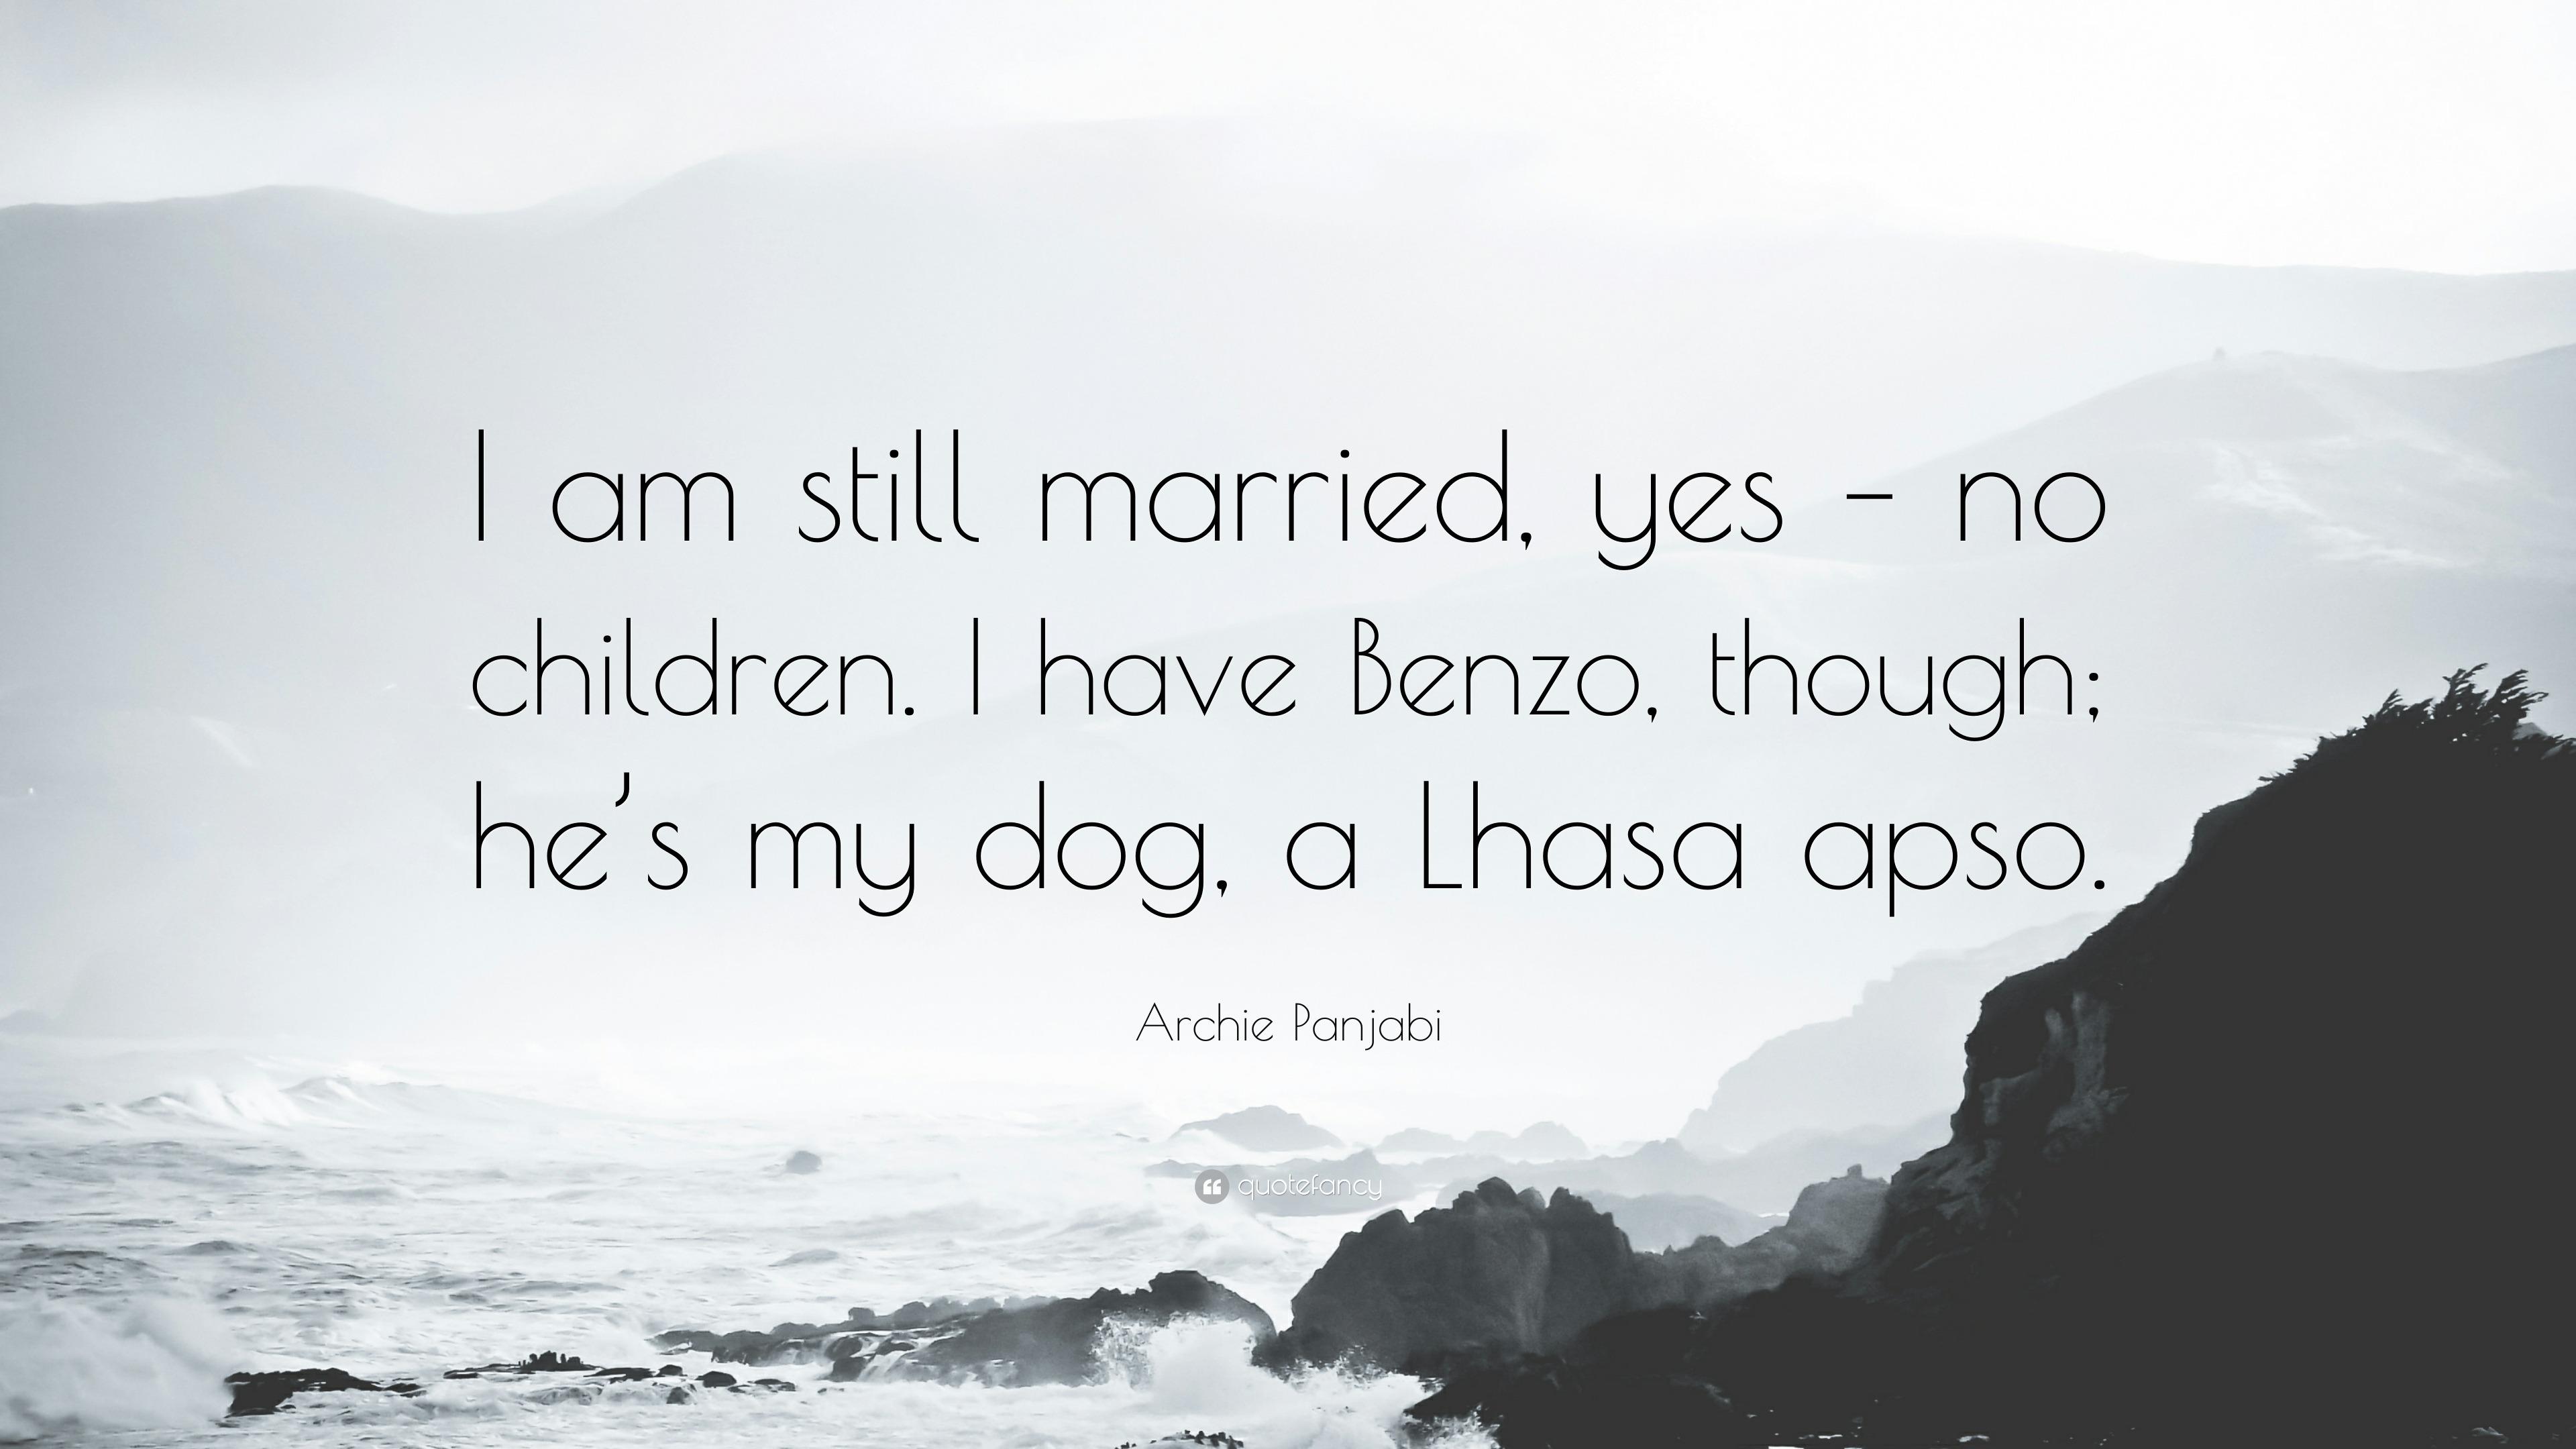 why am i still married